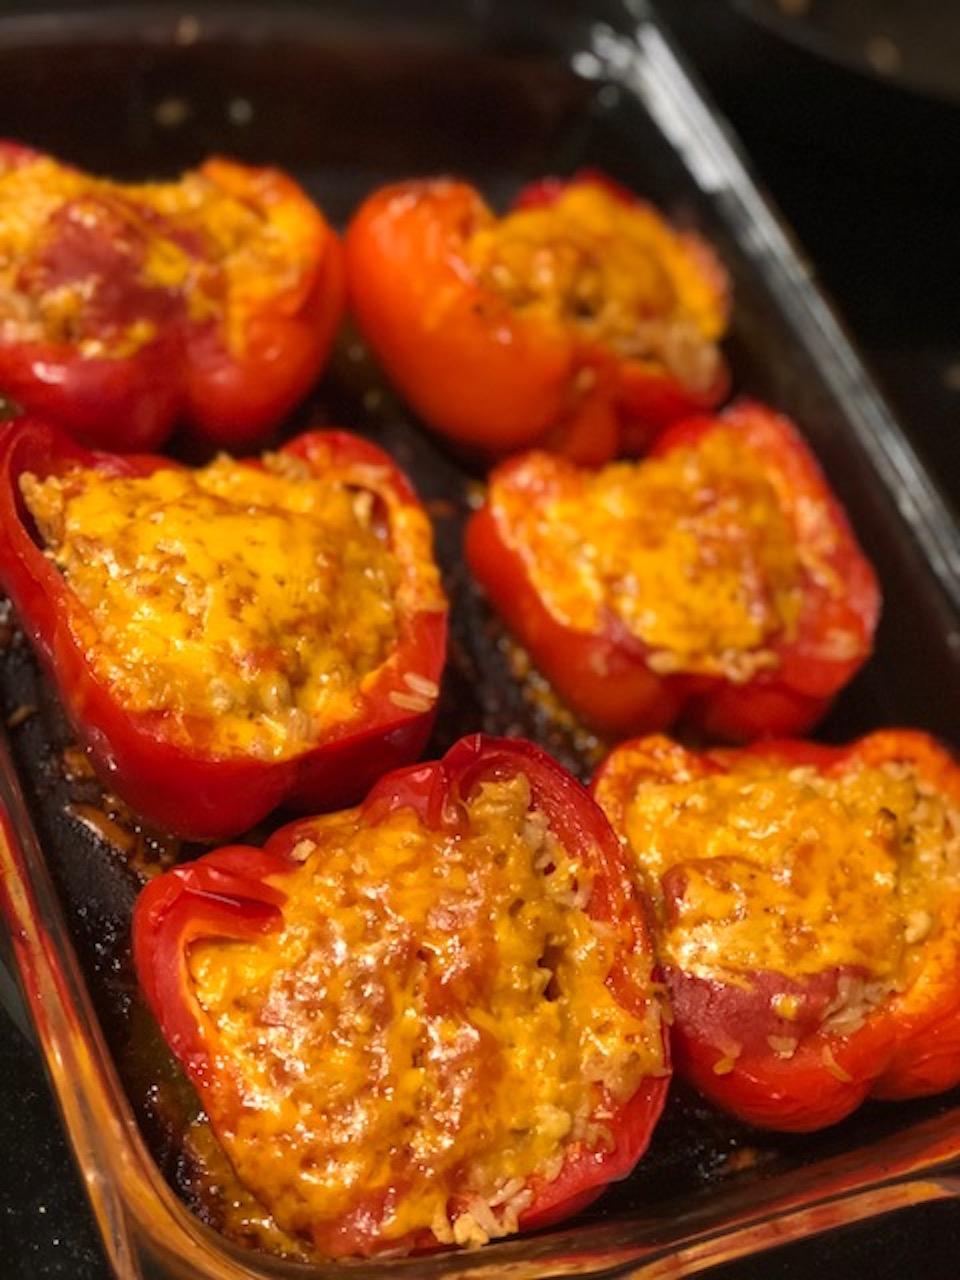 Basmati Rice and Turkey Stuffed Peppers Emily Ott